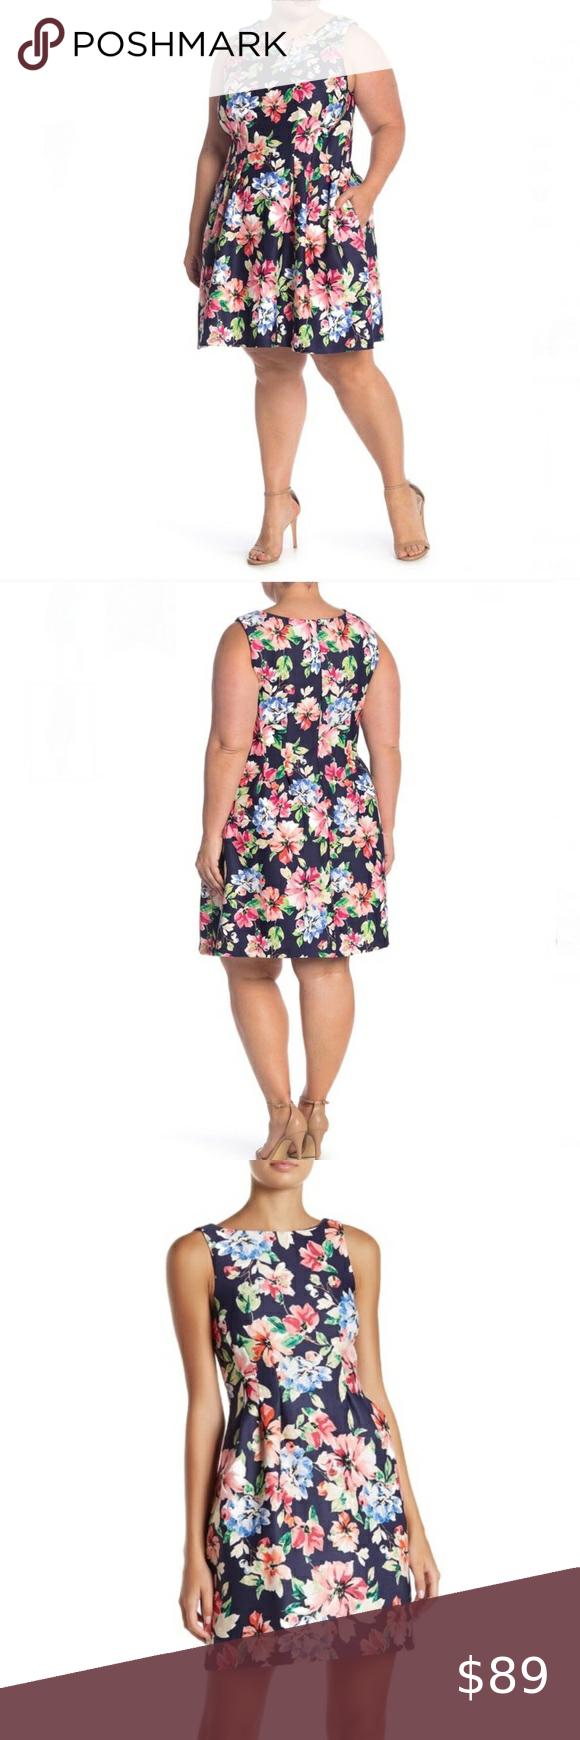 Vince Camuto Nwt Floral Fit Flare Scuba Dress Scuba Dress Long Sleeve Shift Dress Floral Dress Design [ 1740 x 580 Pixel ]